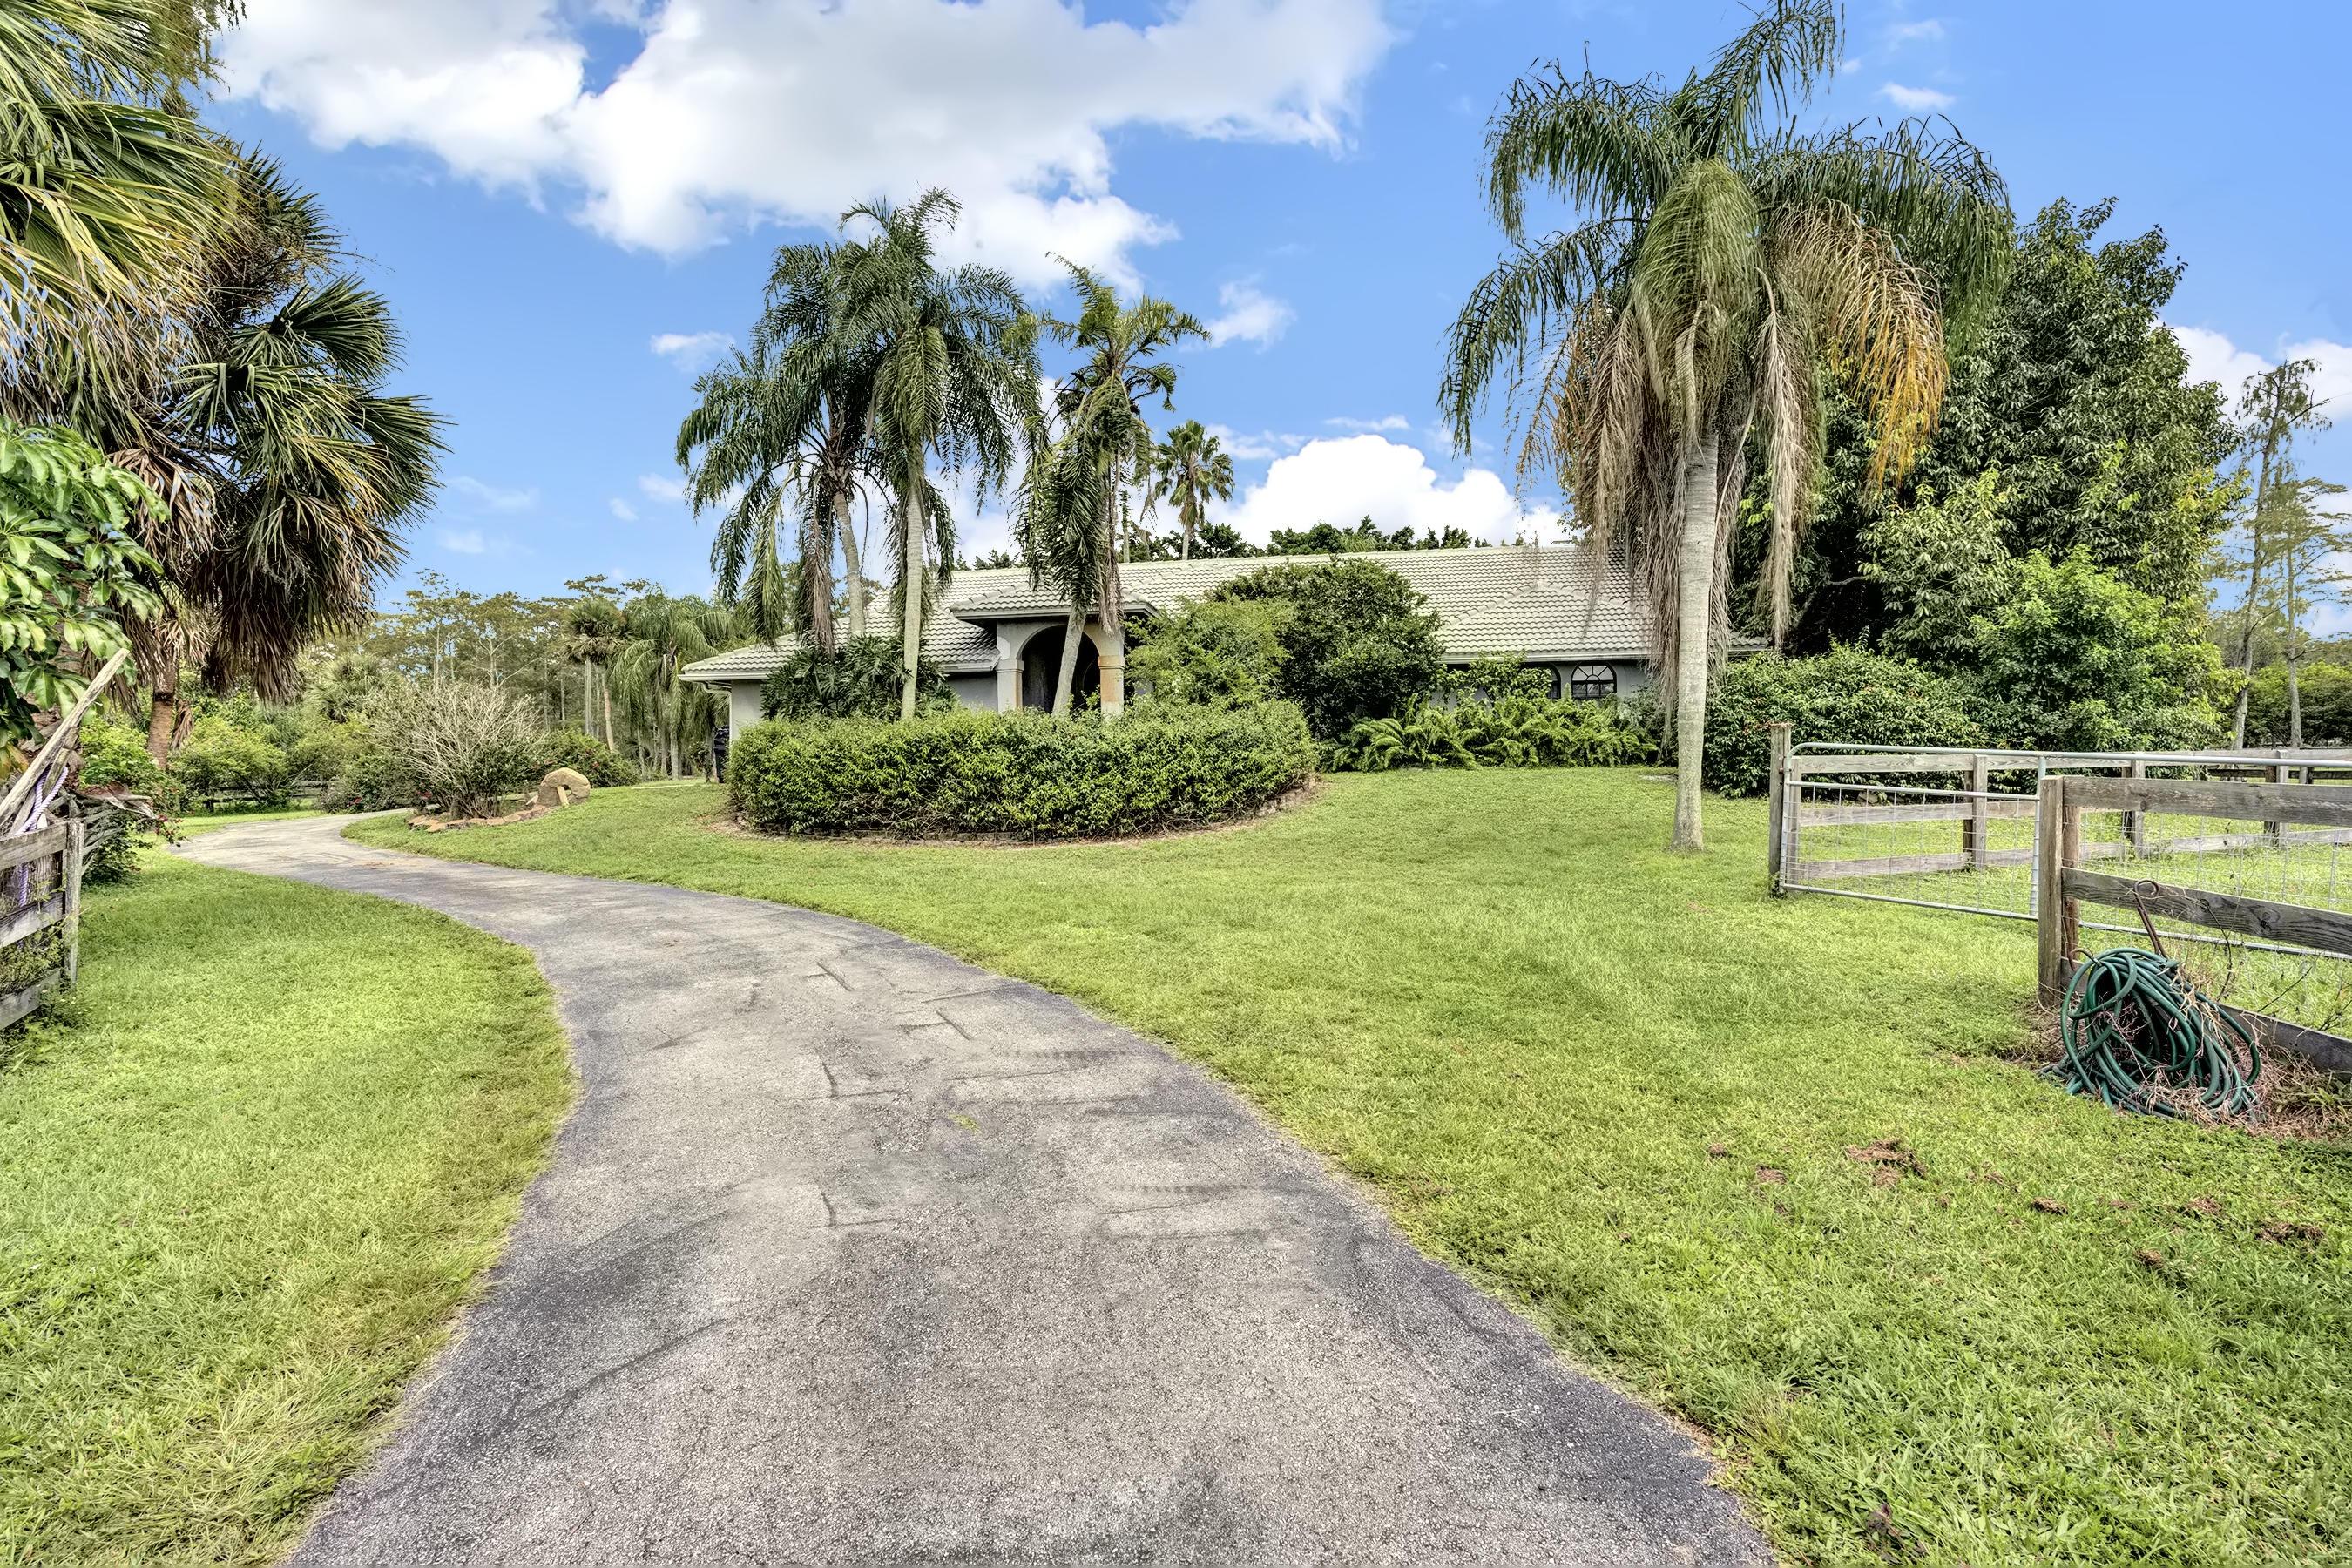 Loxahatchee, Florida 33470, 3 Bedrooms Bedrooms, ,2 BathroomsBathrooms,Residential,For Sale,Deer Run,RX-10659835